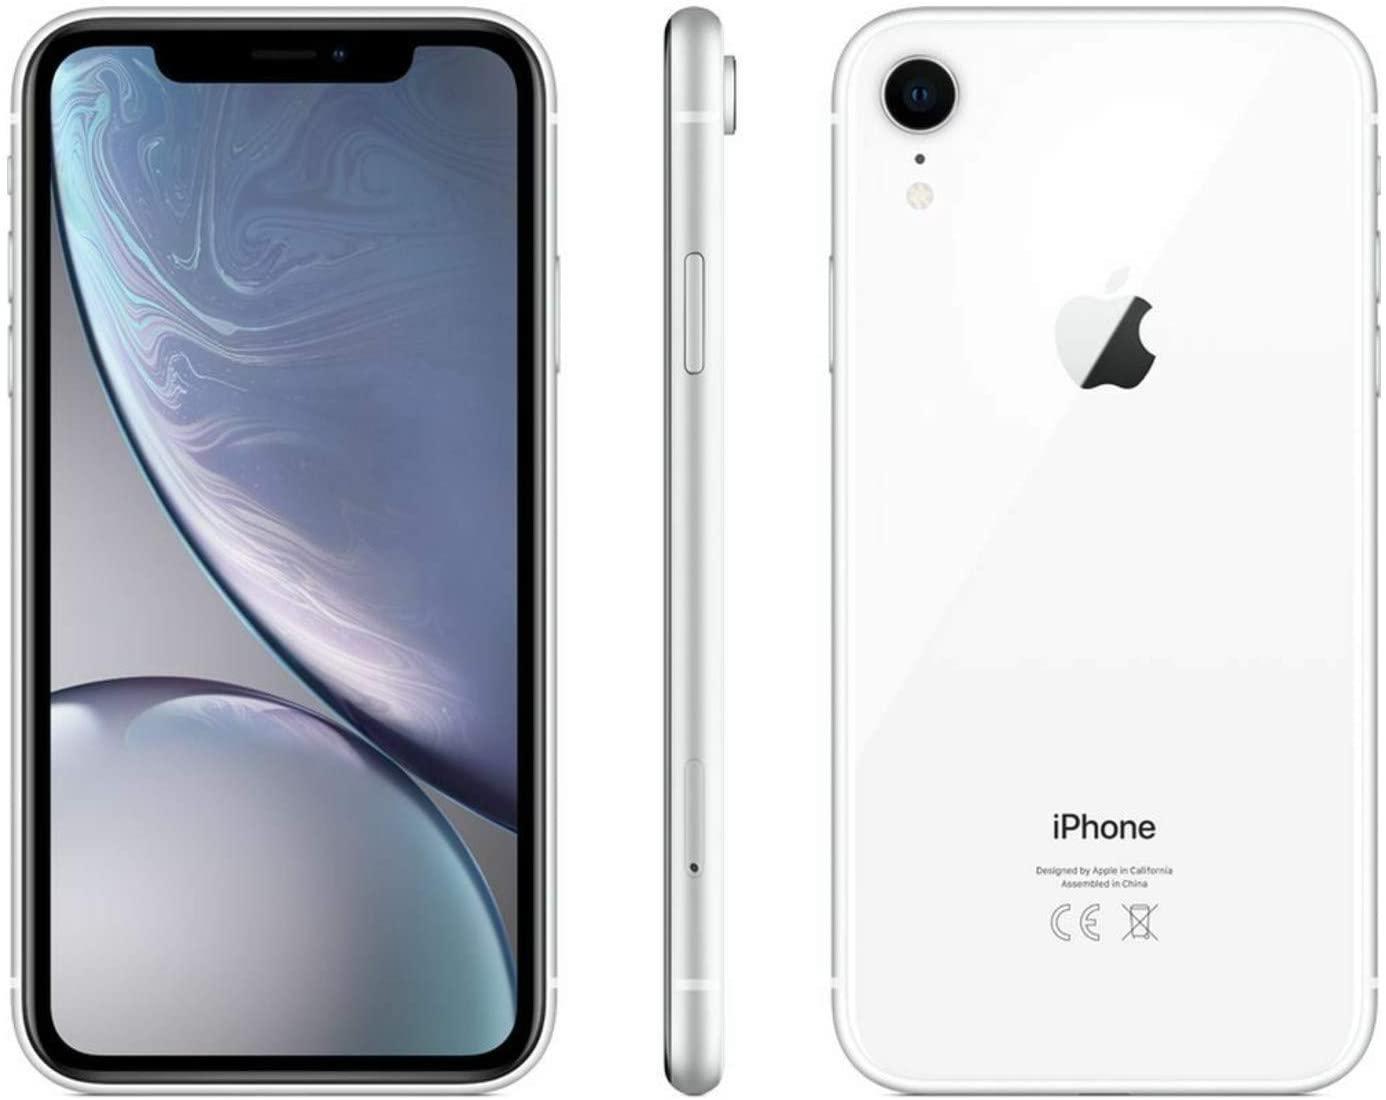 Apple iPhone XR, 128GB, White - For Verizon (Renewed)